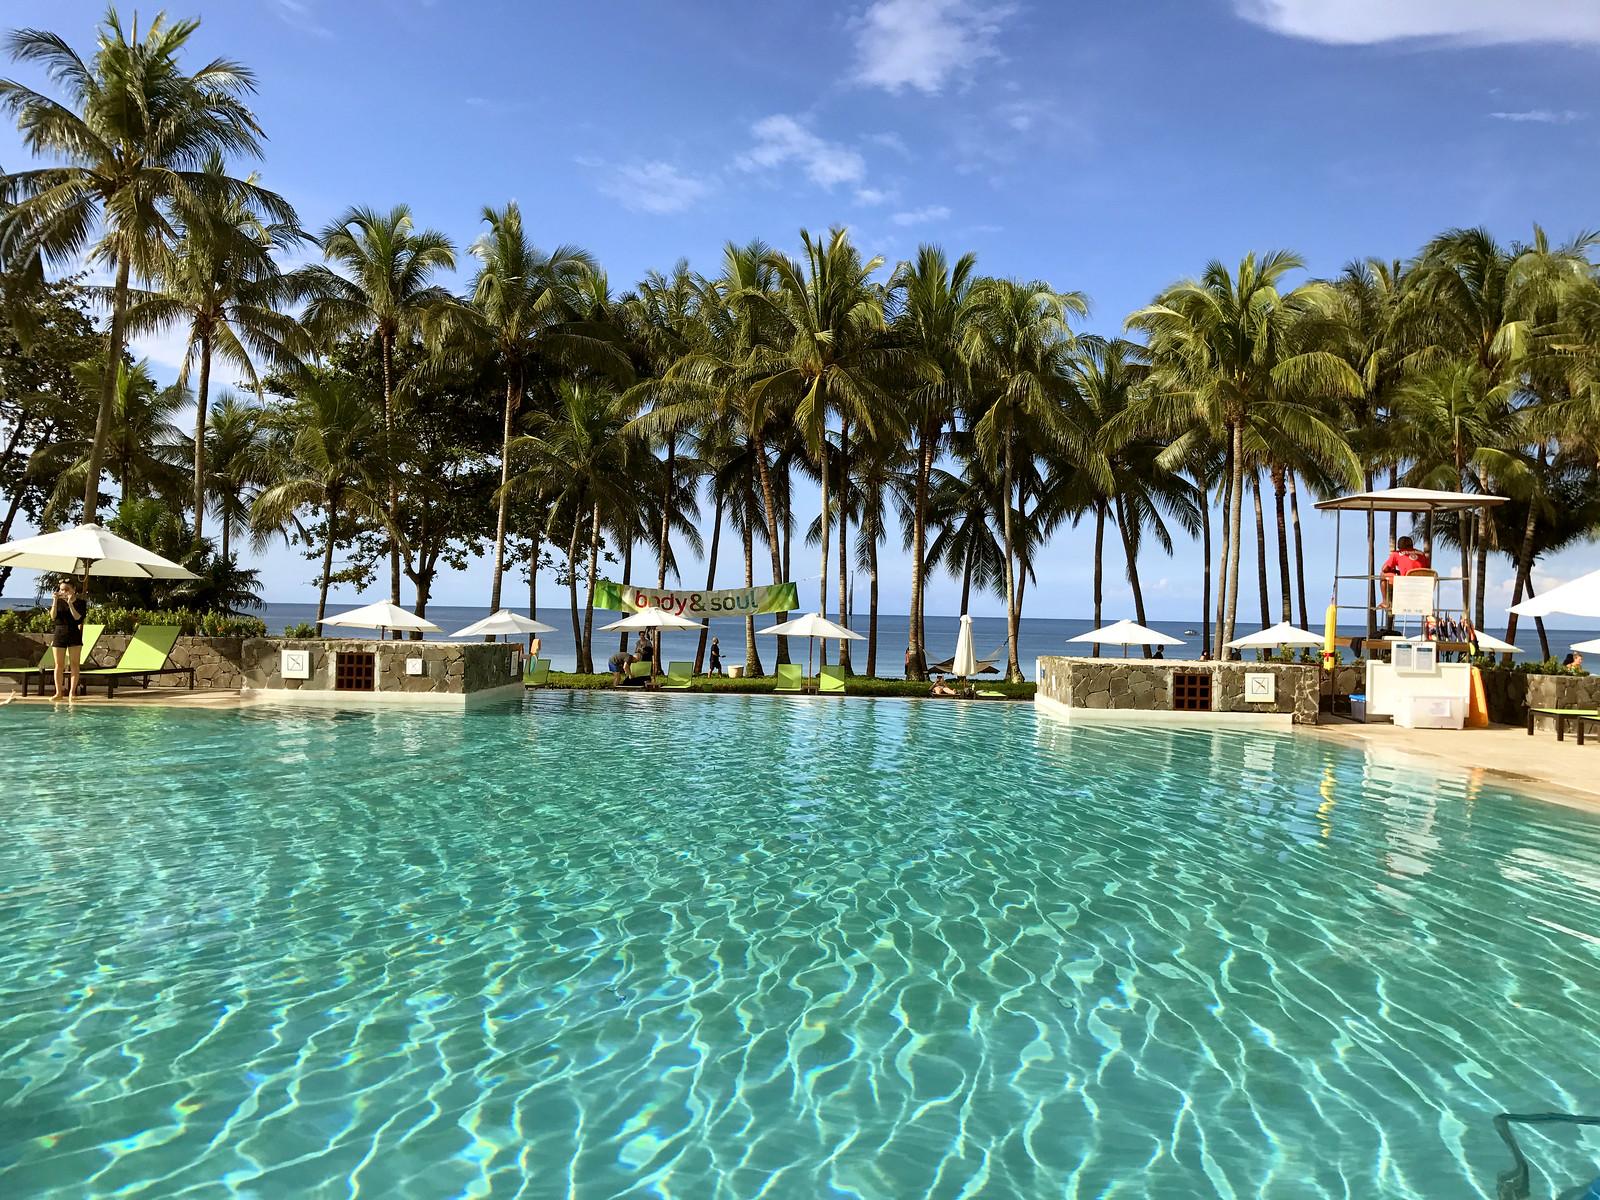 Main swimming pool in Club Med Bintan